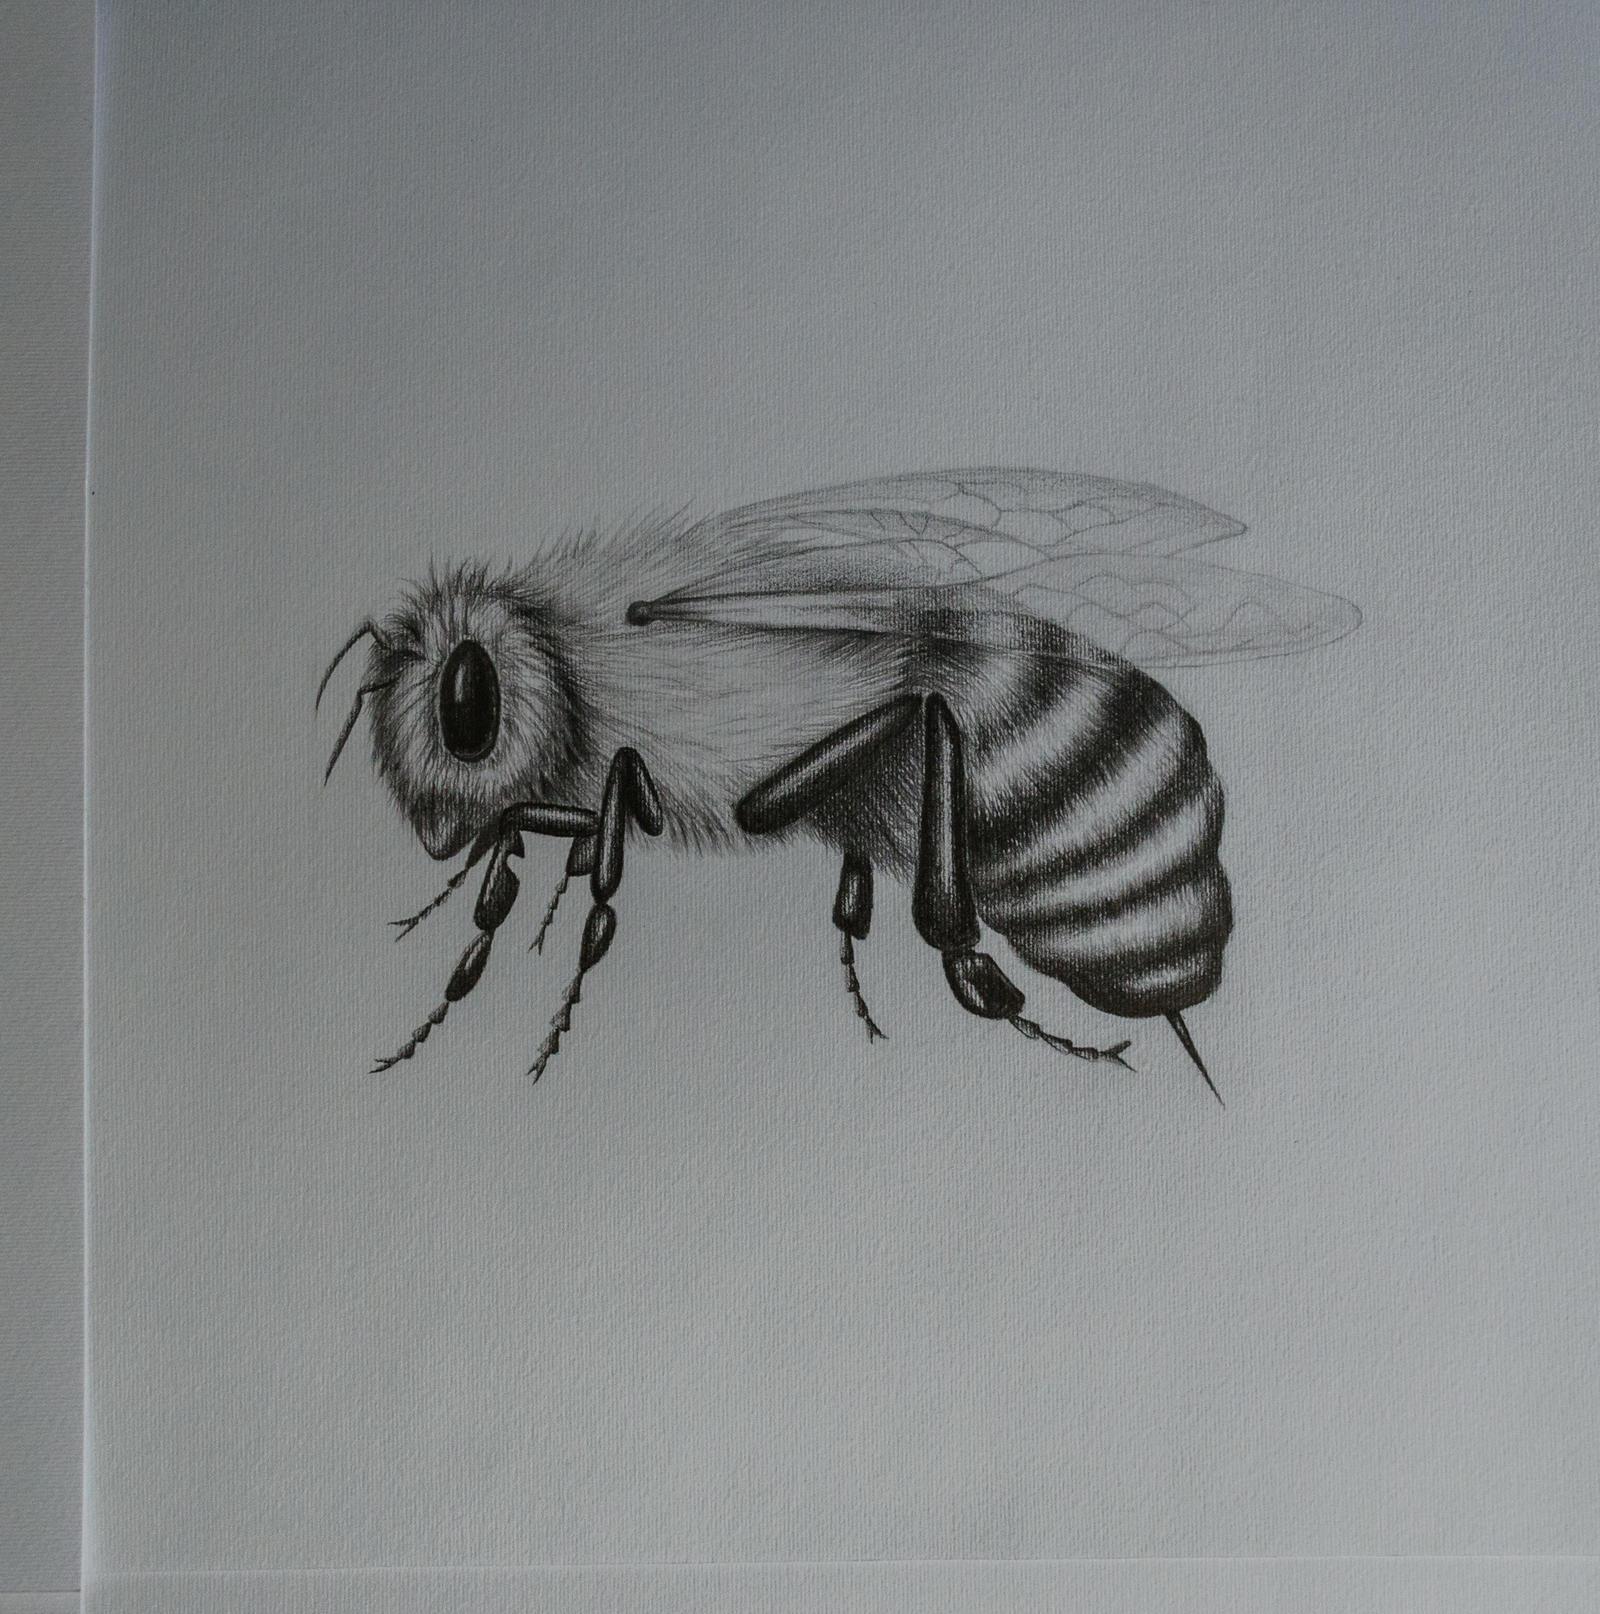 A bee #2